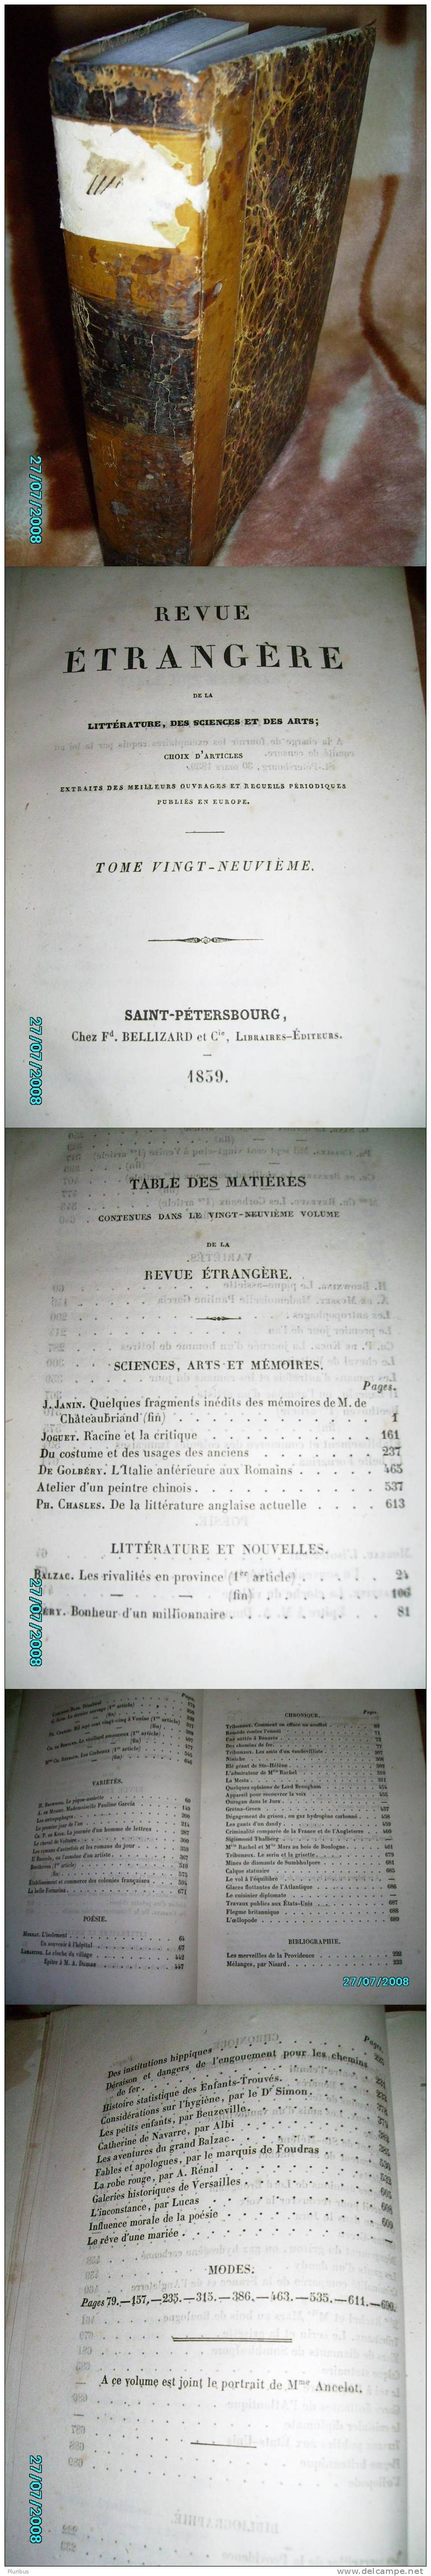 1839 RUSSIA PETERBURG, REVUE ETRANGERE - Magazines - Before 1900